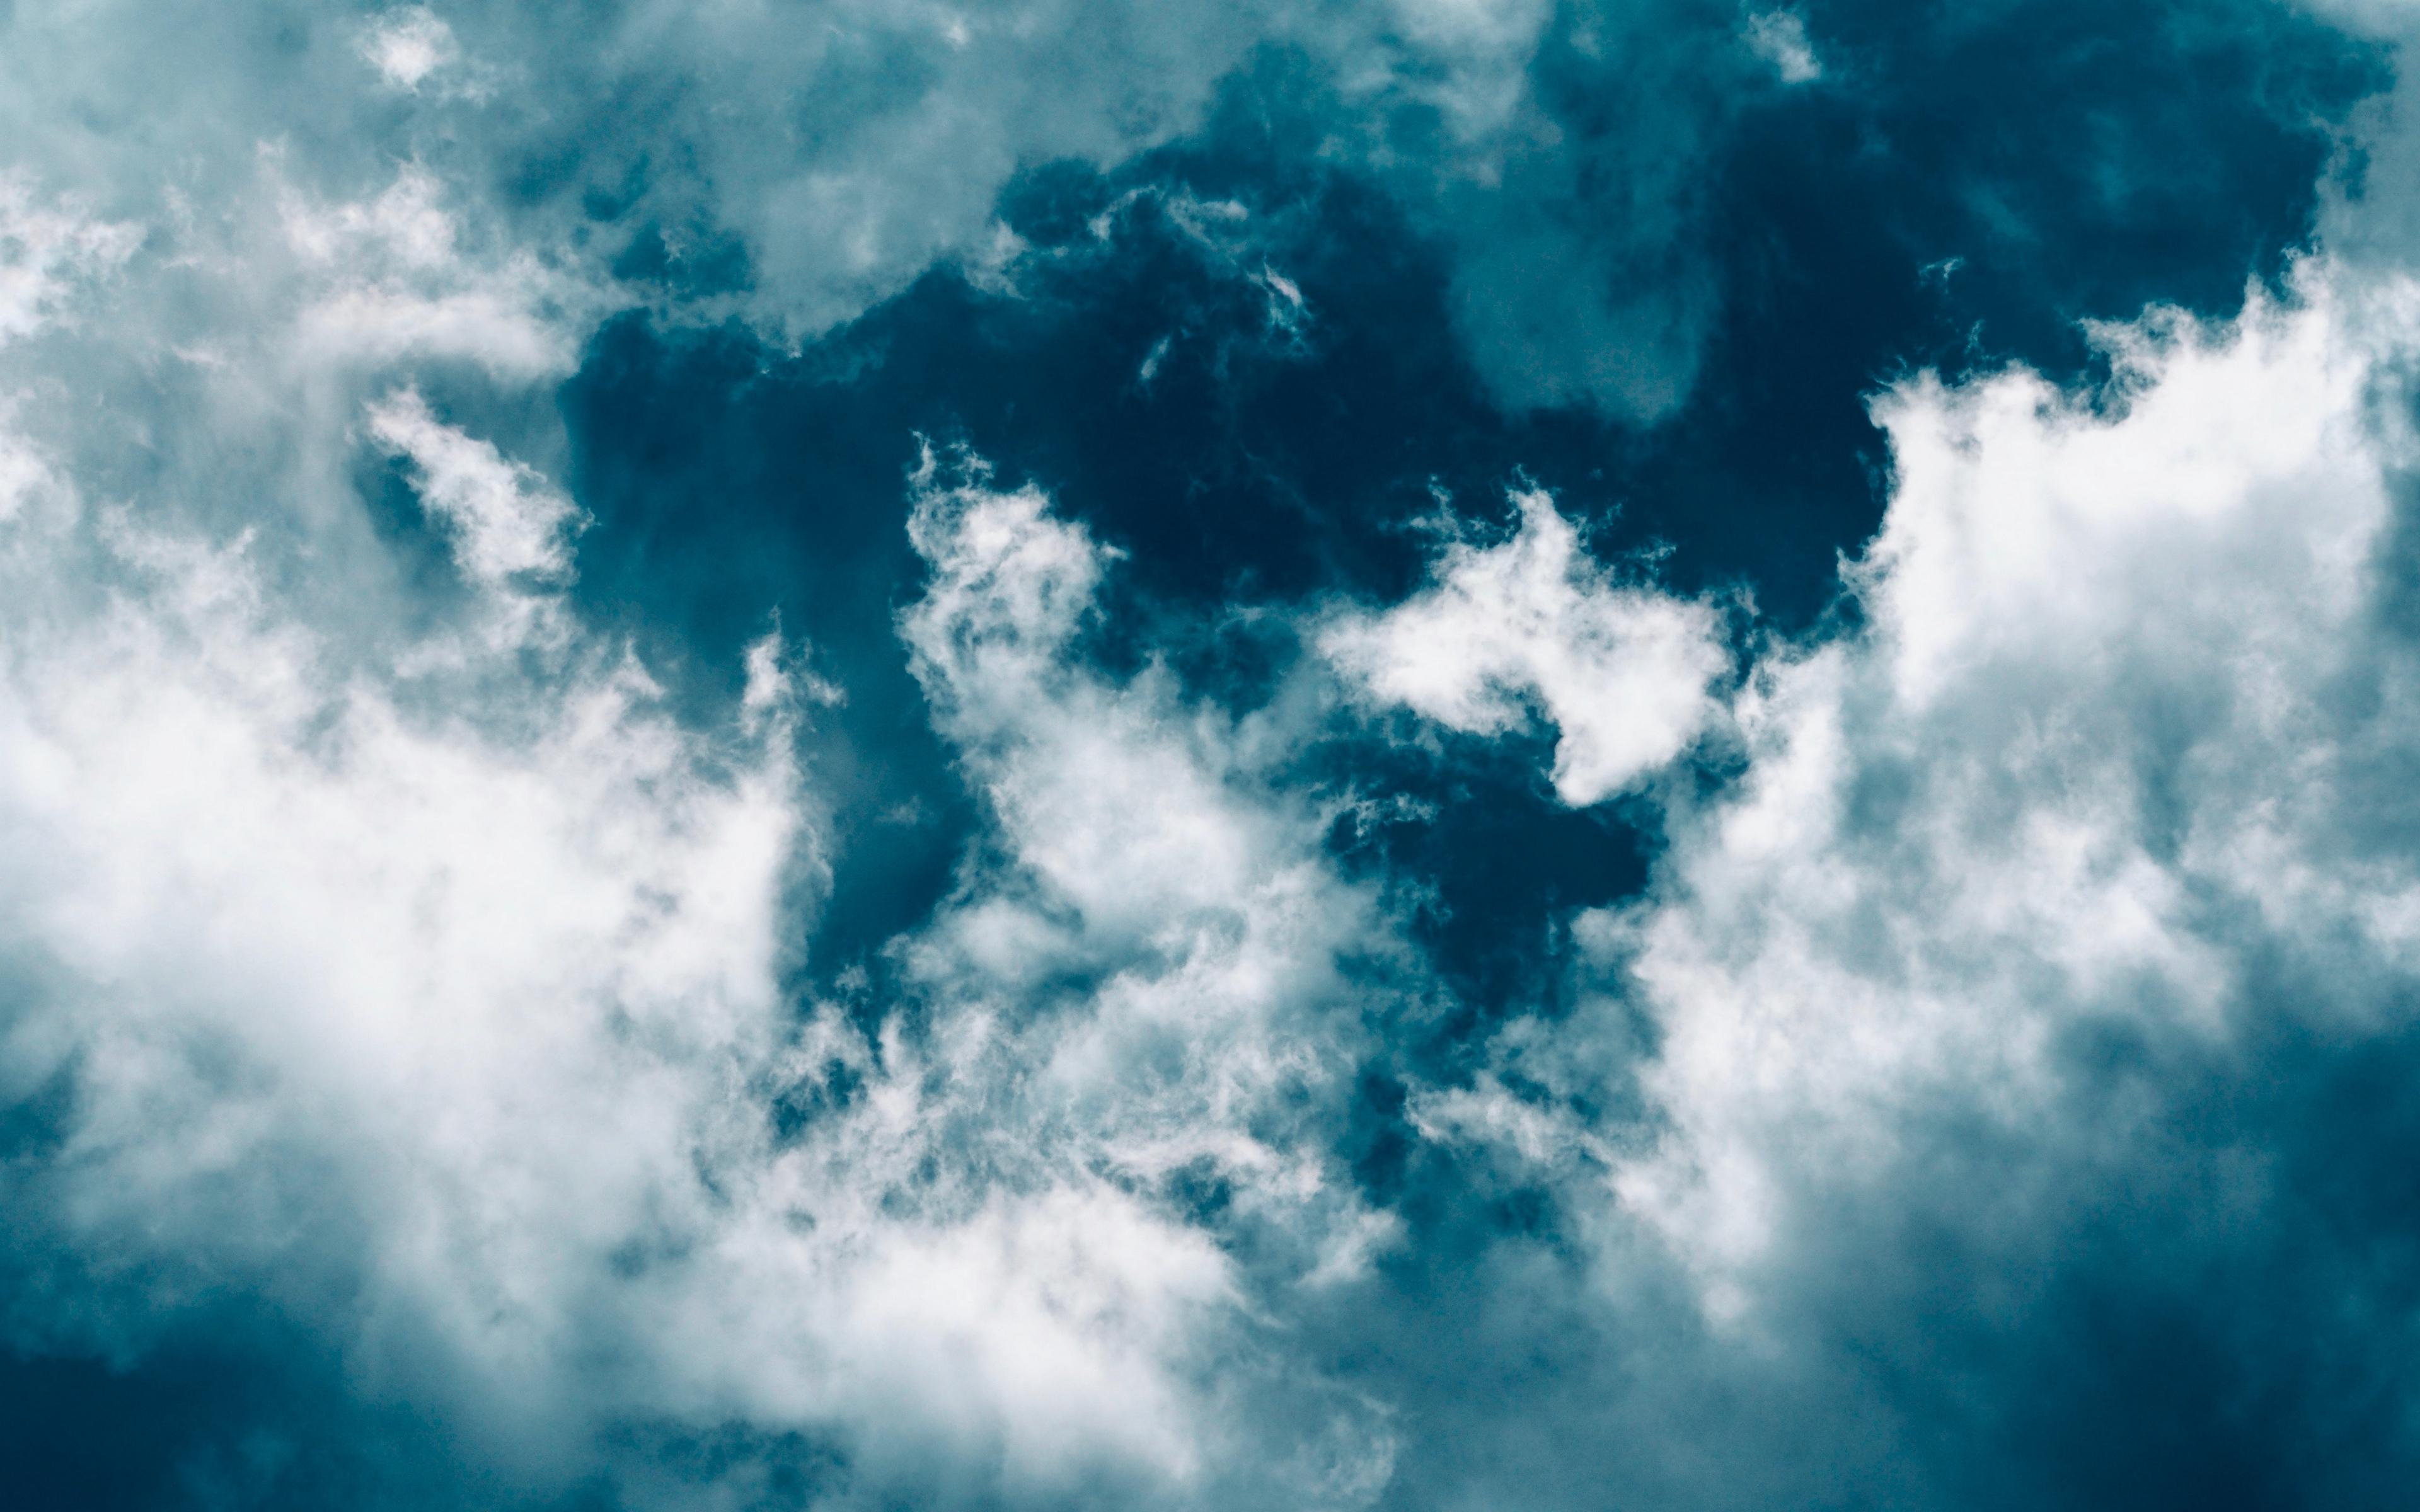 Wallpaper Clouds Sky Porous Blue White Cloud Background For Laptop 3840x2400 Wallpaper Teahub Io